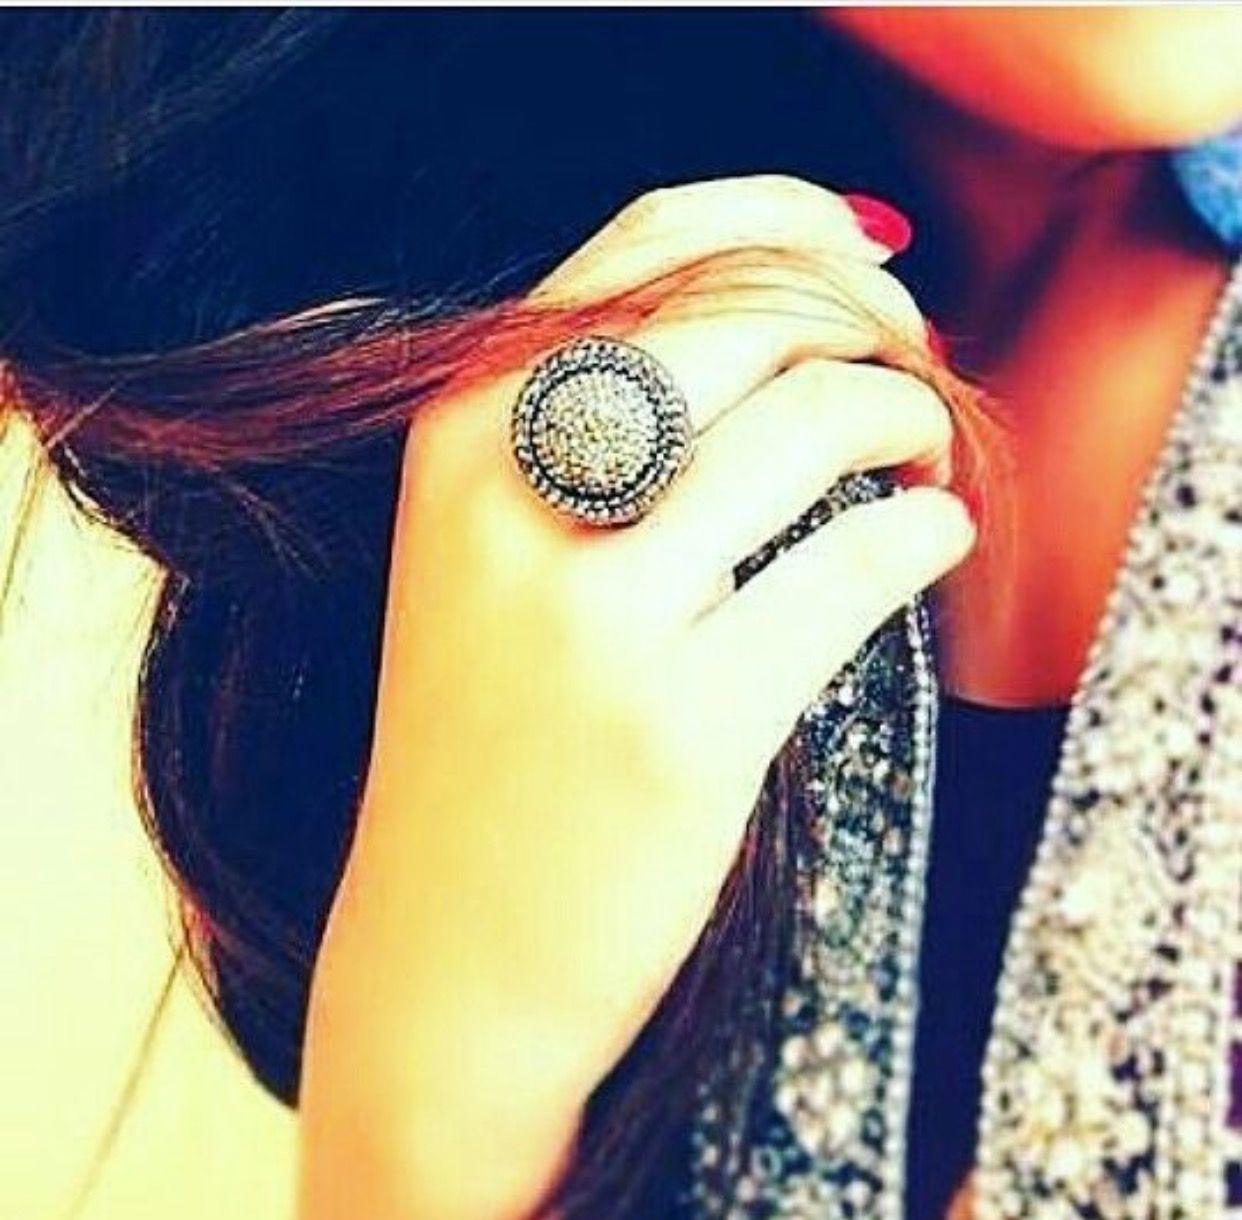 Pin mehndi and bangles display pics awesome dp wallpaper on pinterest - Rings